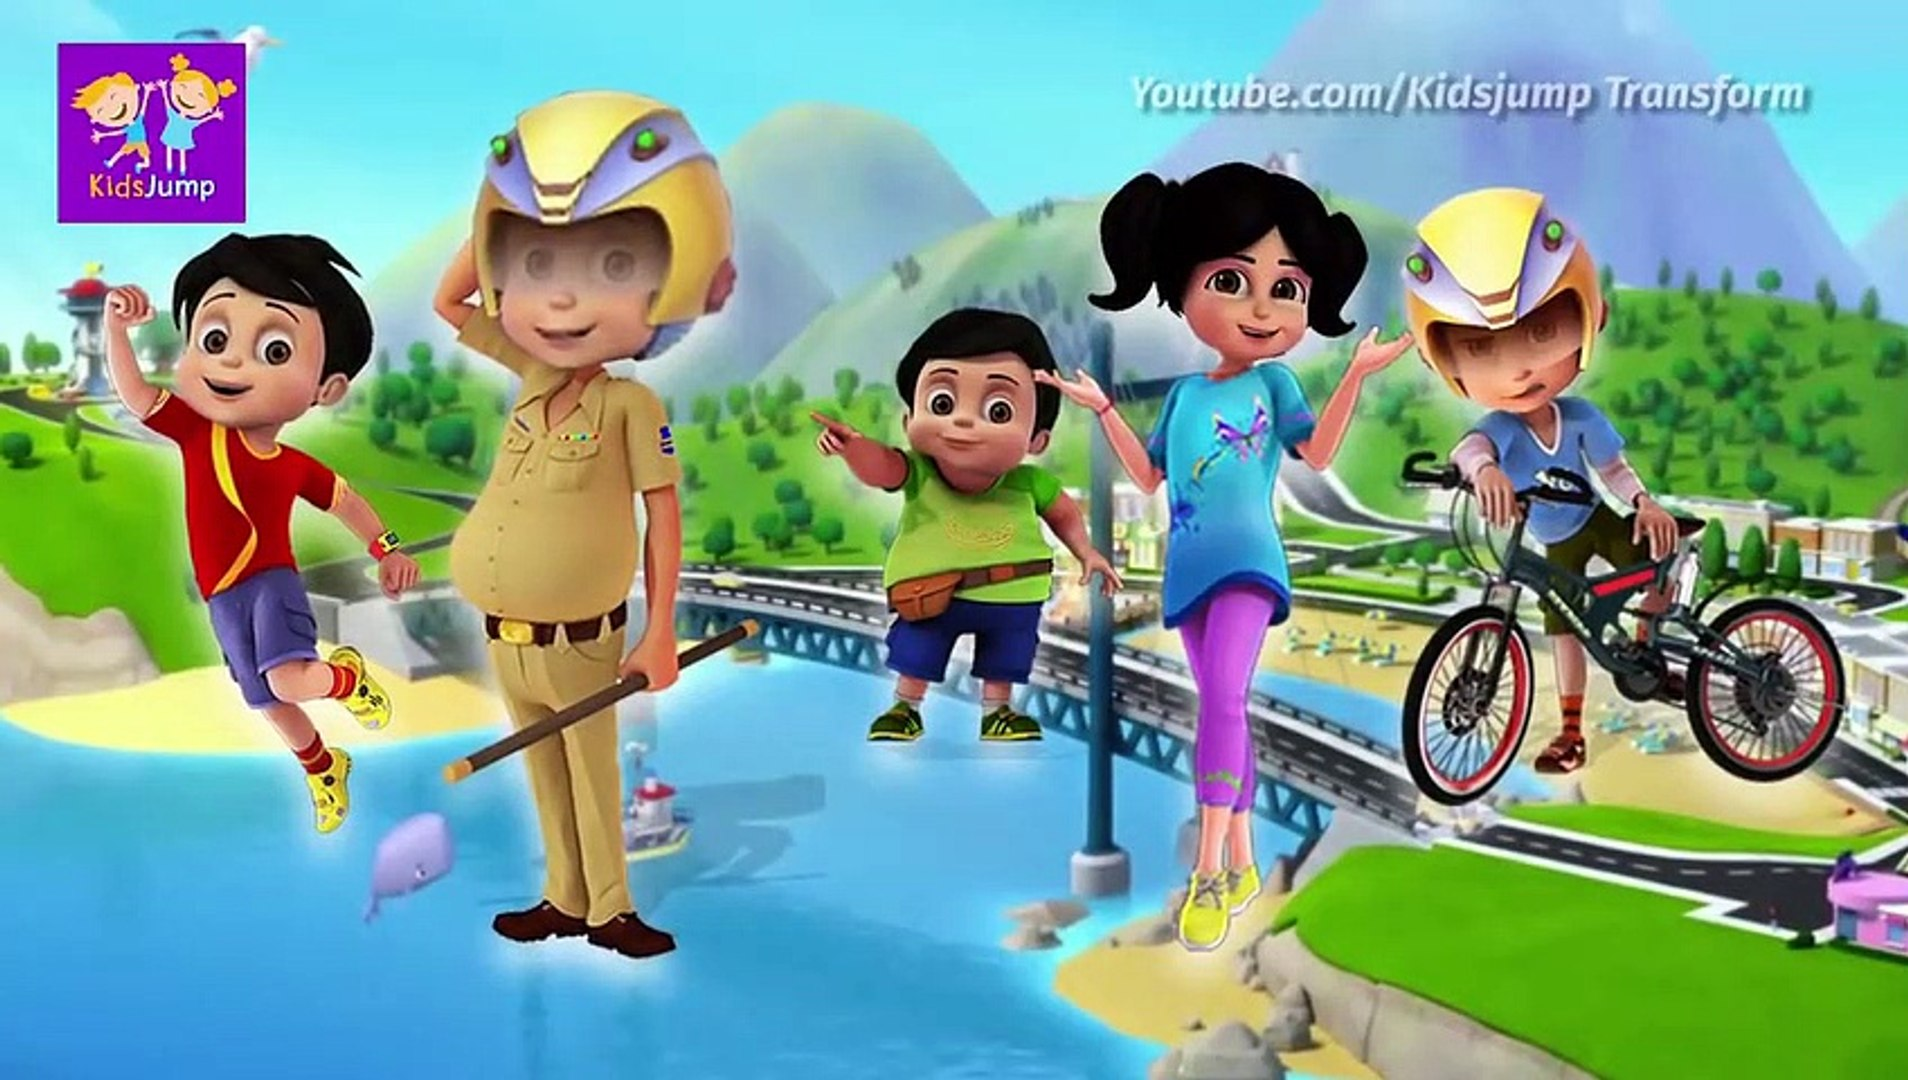 Shiva Cartoon VS VIR THE ROBOT BOY #07 Full Episode TV Movie Cartoon For Kids ANTV , Tv hd 2019 cine